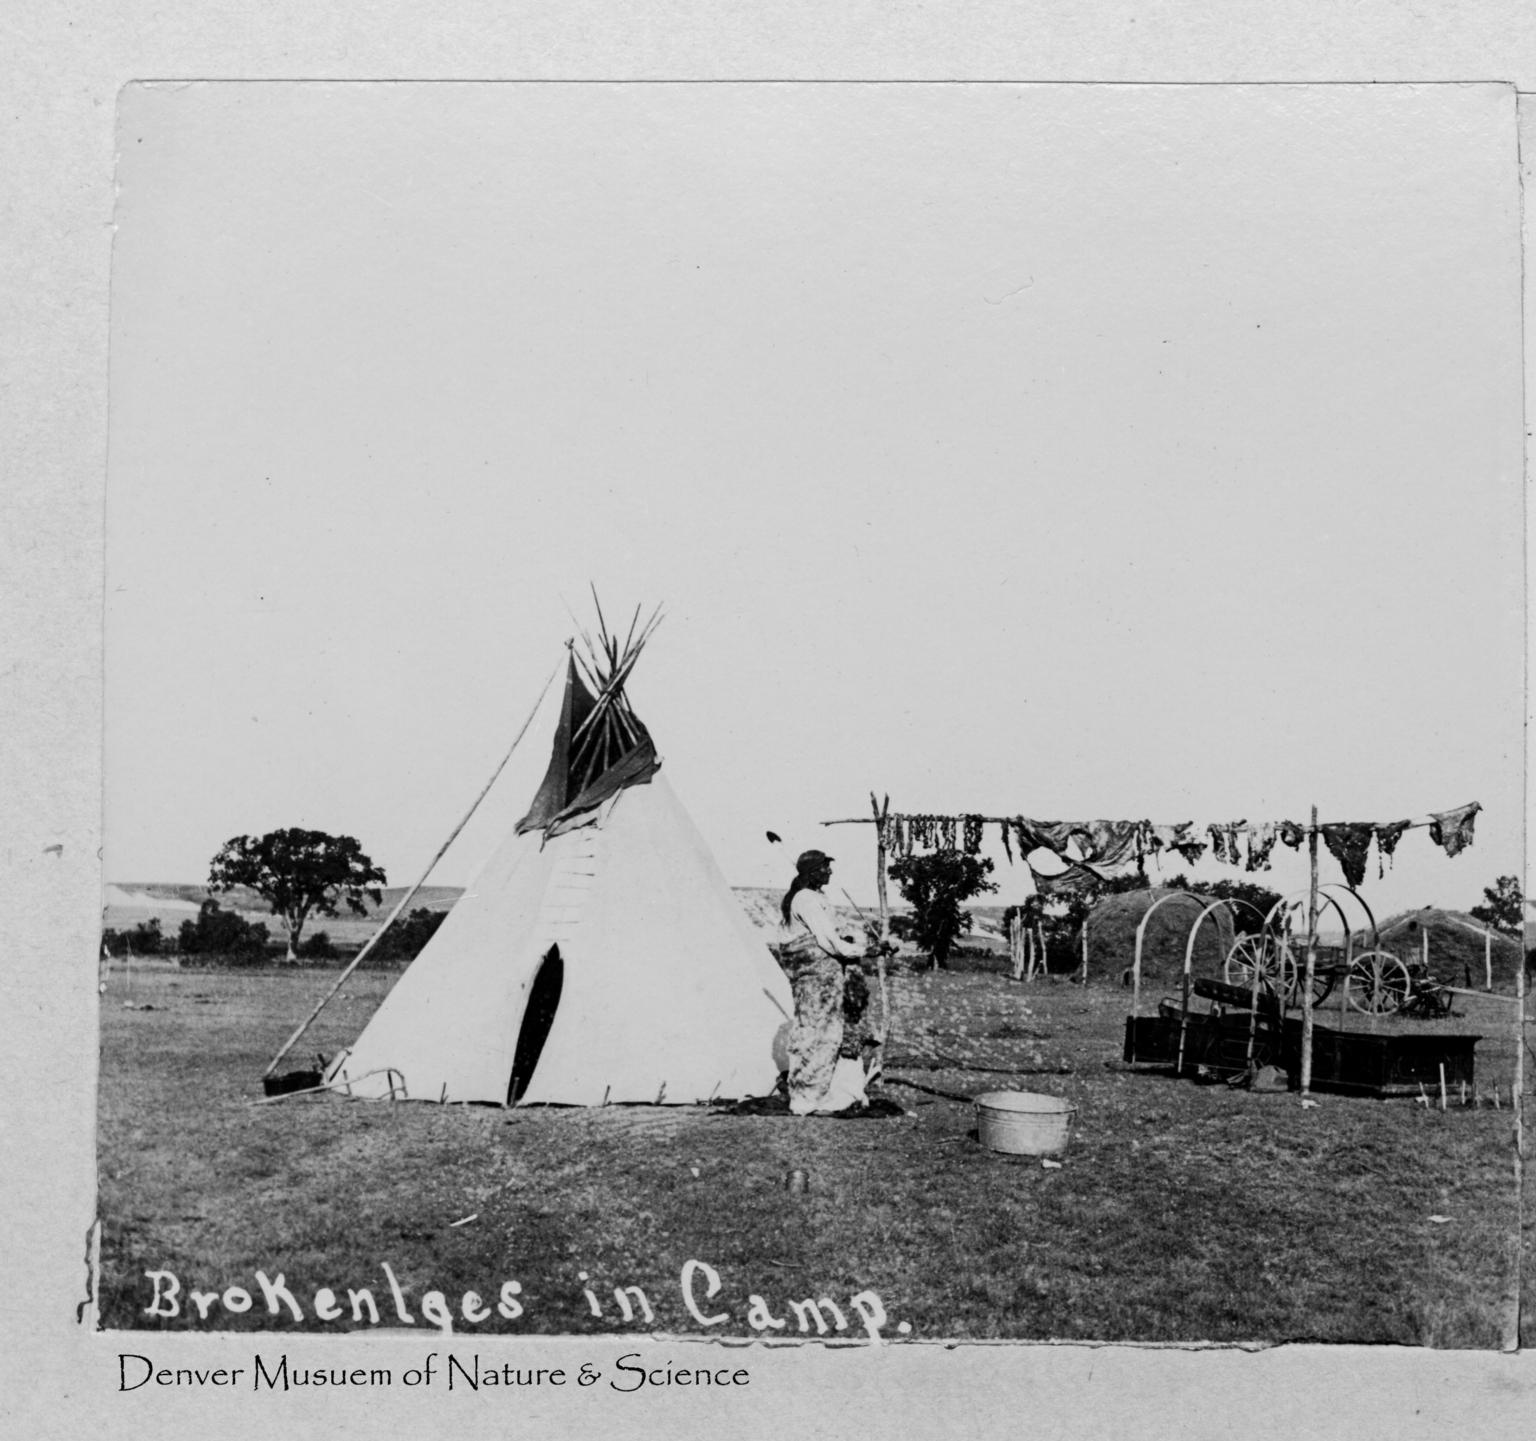 Sioux Indian Samuel Brokenlegs